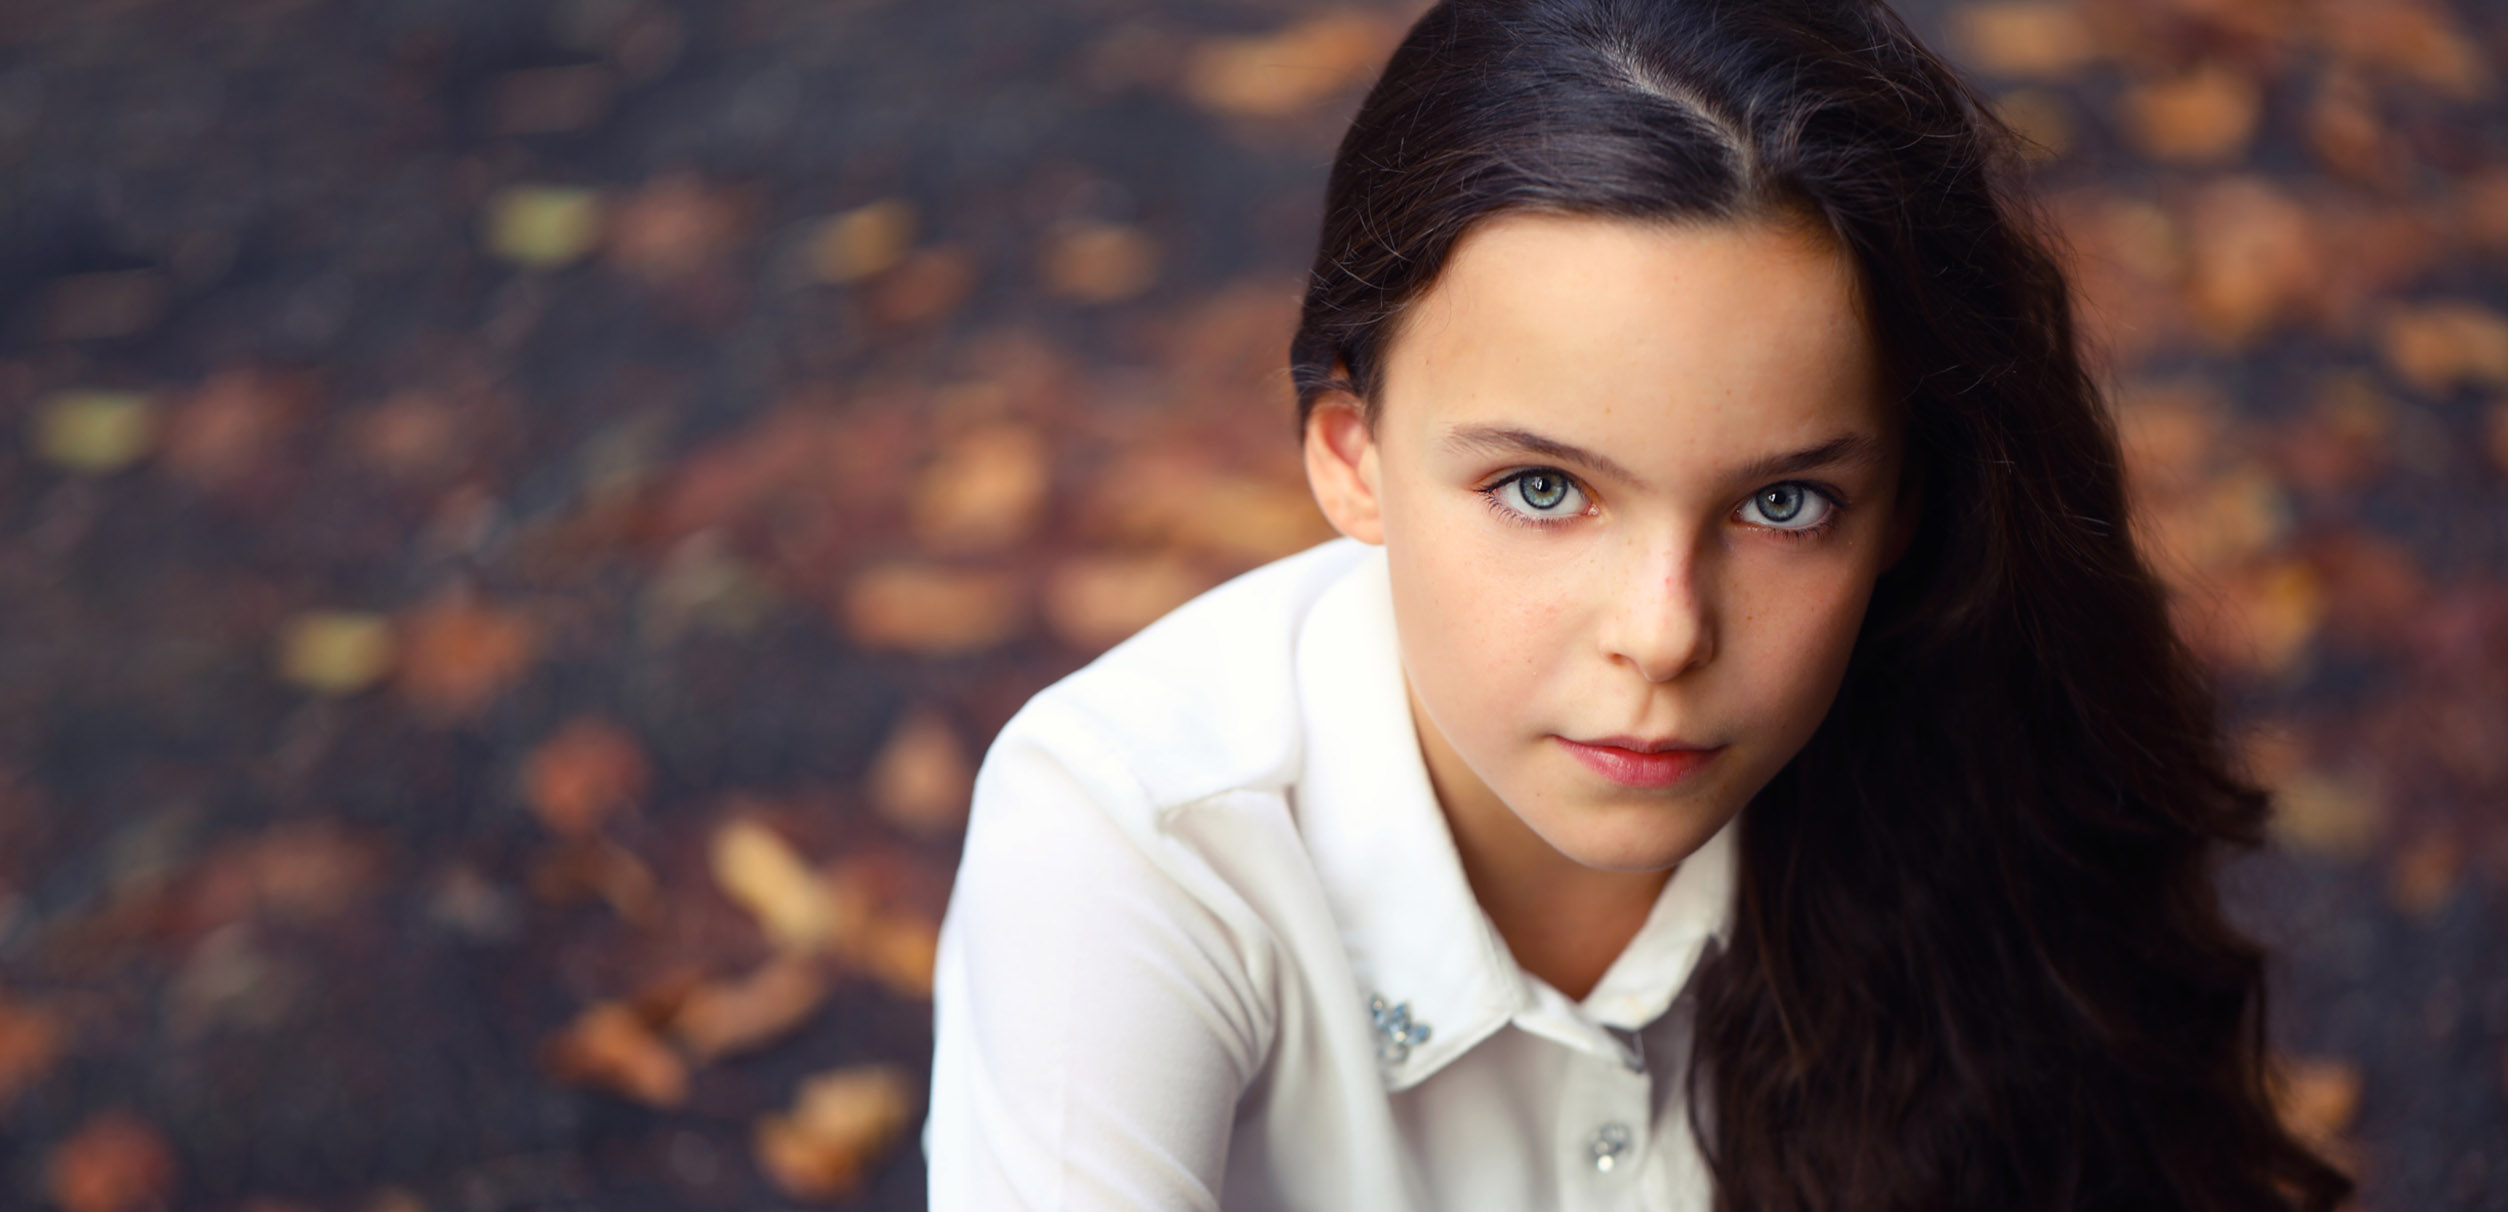 La vita promessa 2 personaggi Sara Ciocca